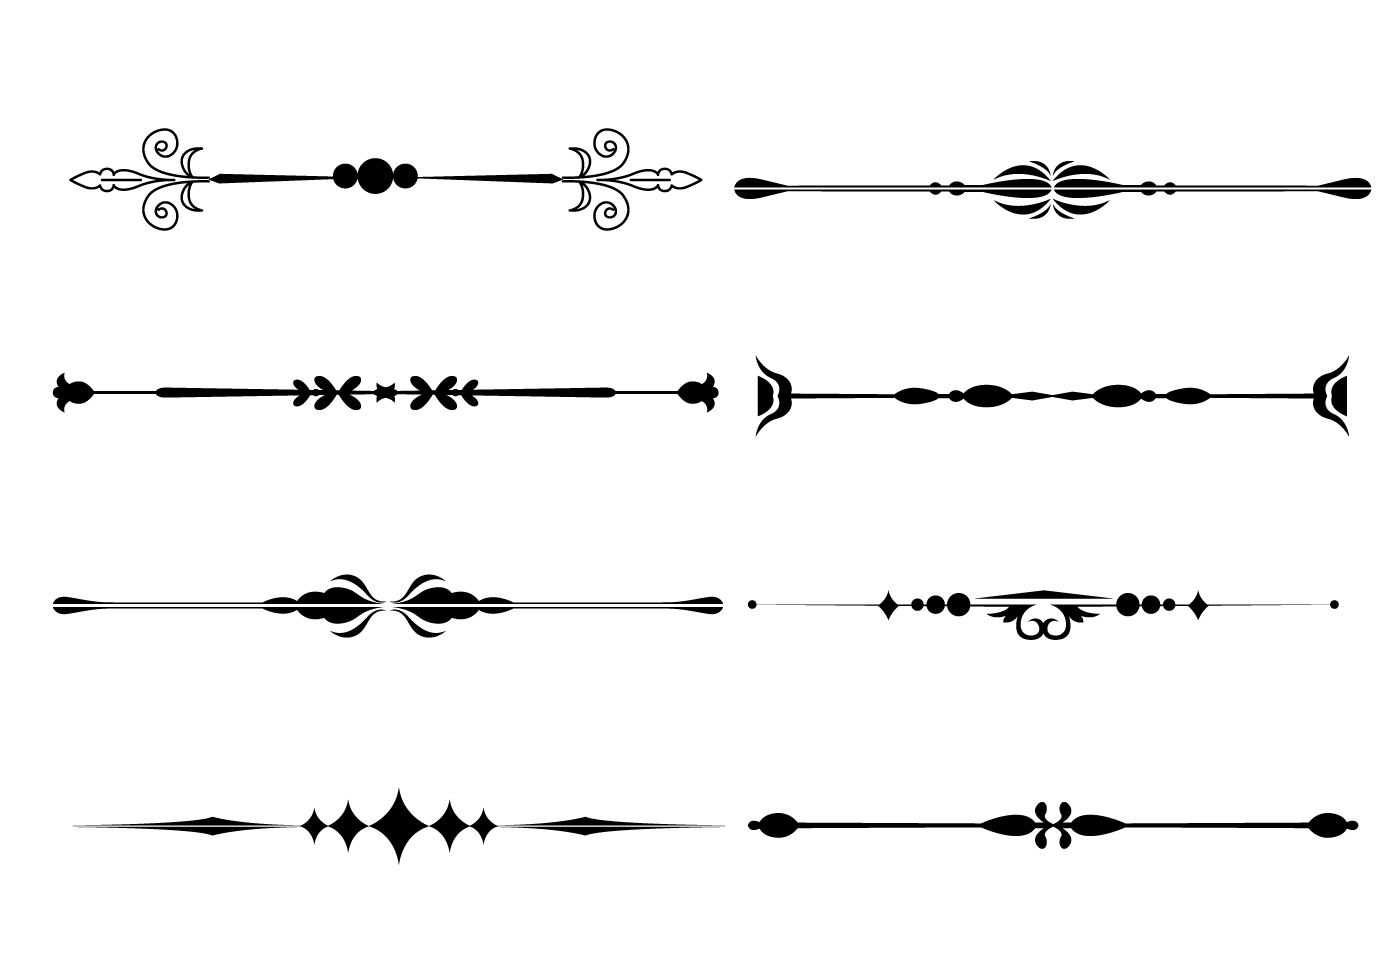 Line Art Vector Illustrator : Fancy line ornament vectors download free vector art